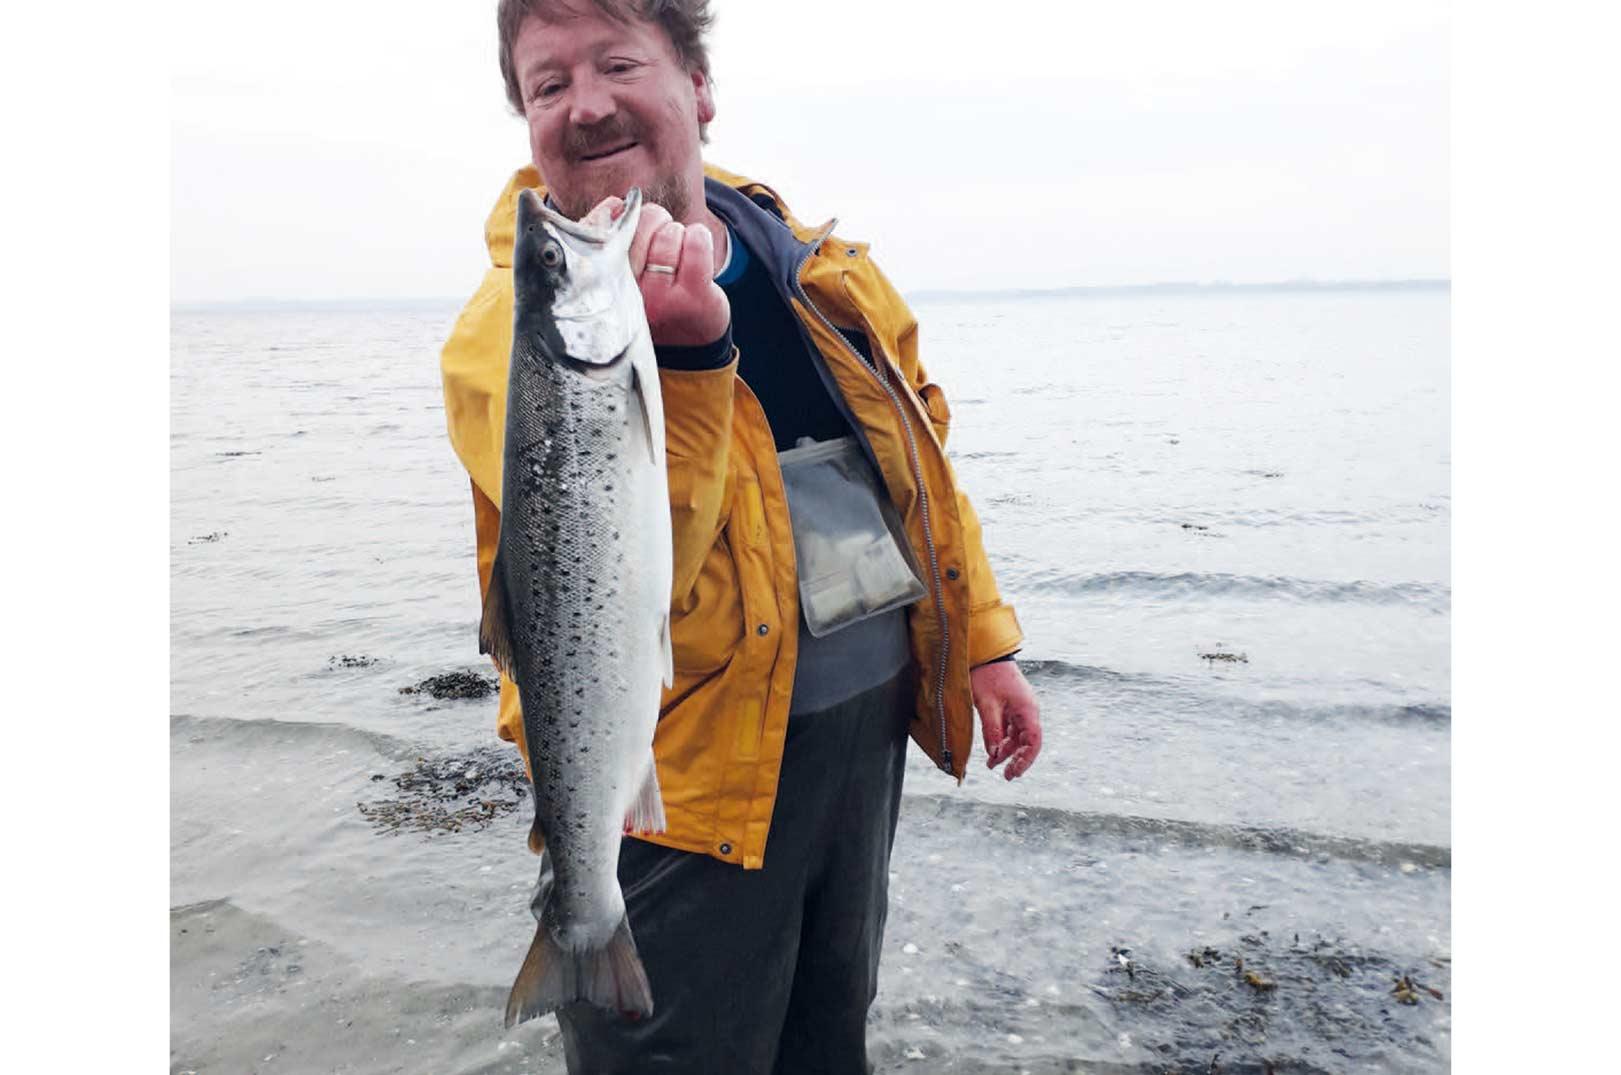 Tobias Hjortkjær Schultz: Blind høne kan også finde et (sølv)korn. Dennne fisk fra februar gjorde en tyk, gammel fiskeskribent glad for en dag.